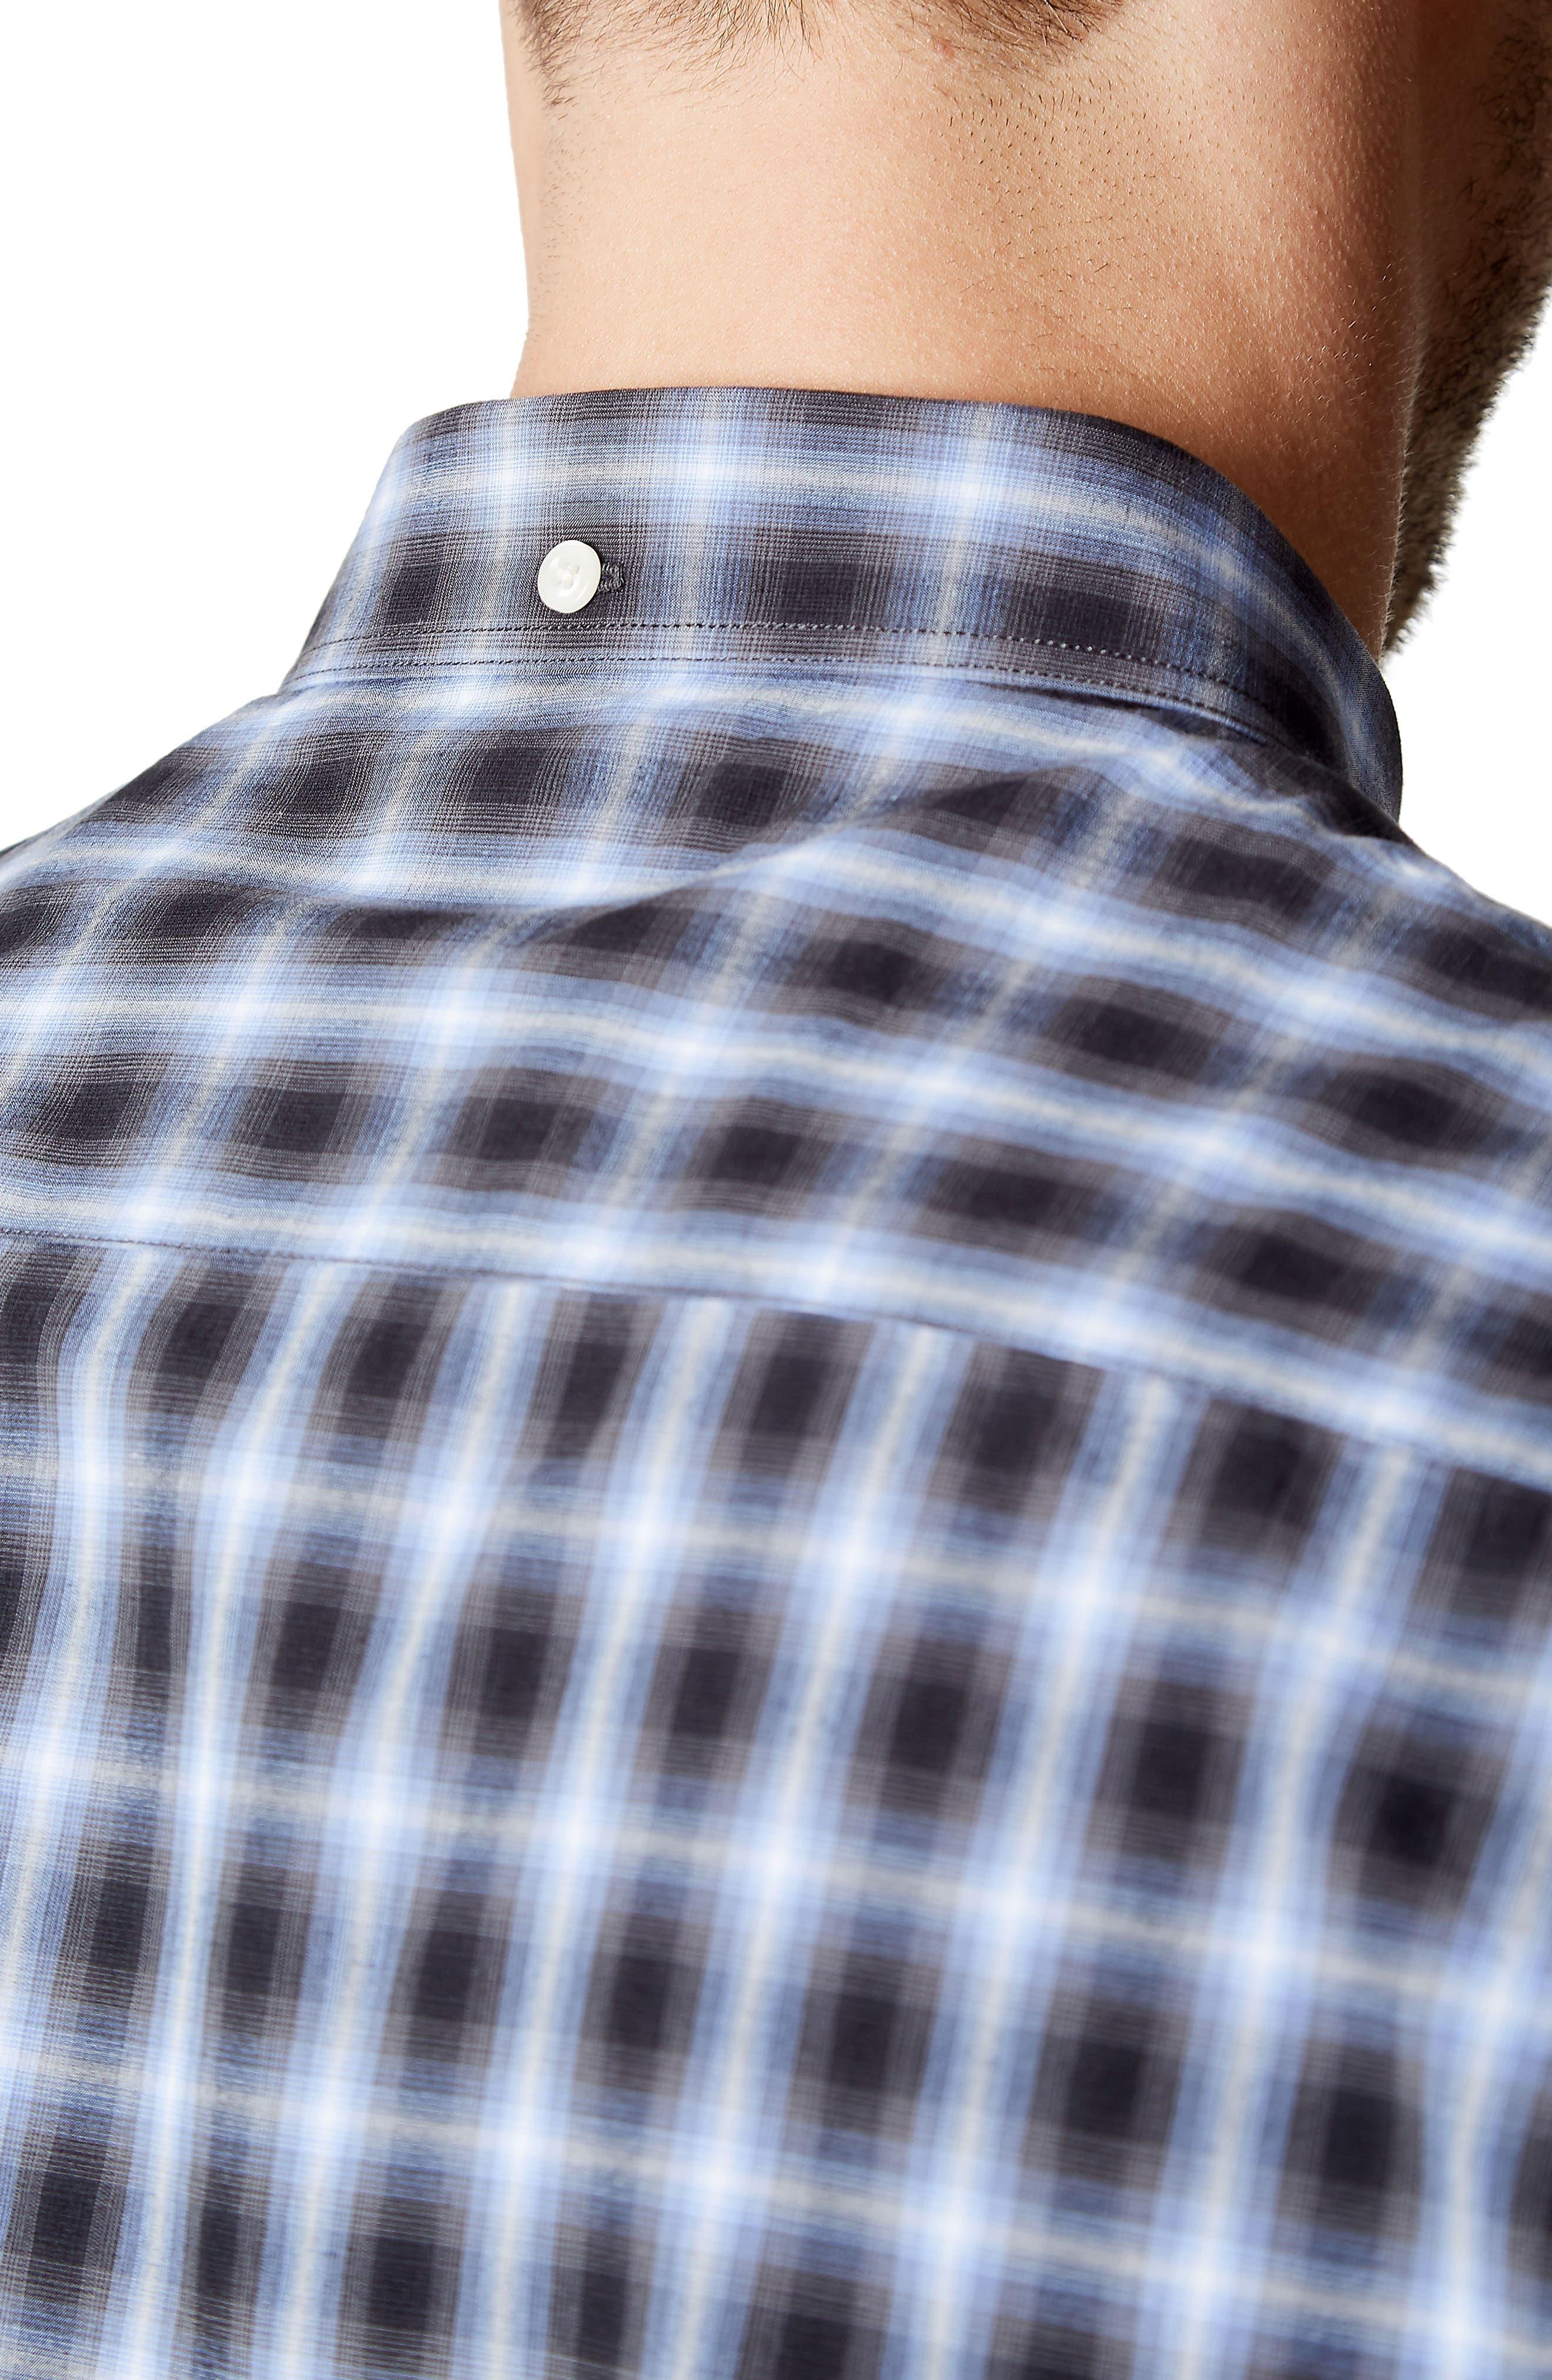 Higher Ground Woven Shirt,                             Alternate thumbnail 4, color,                             Blue